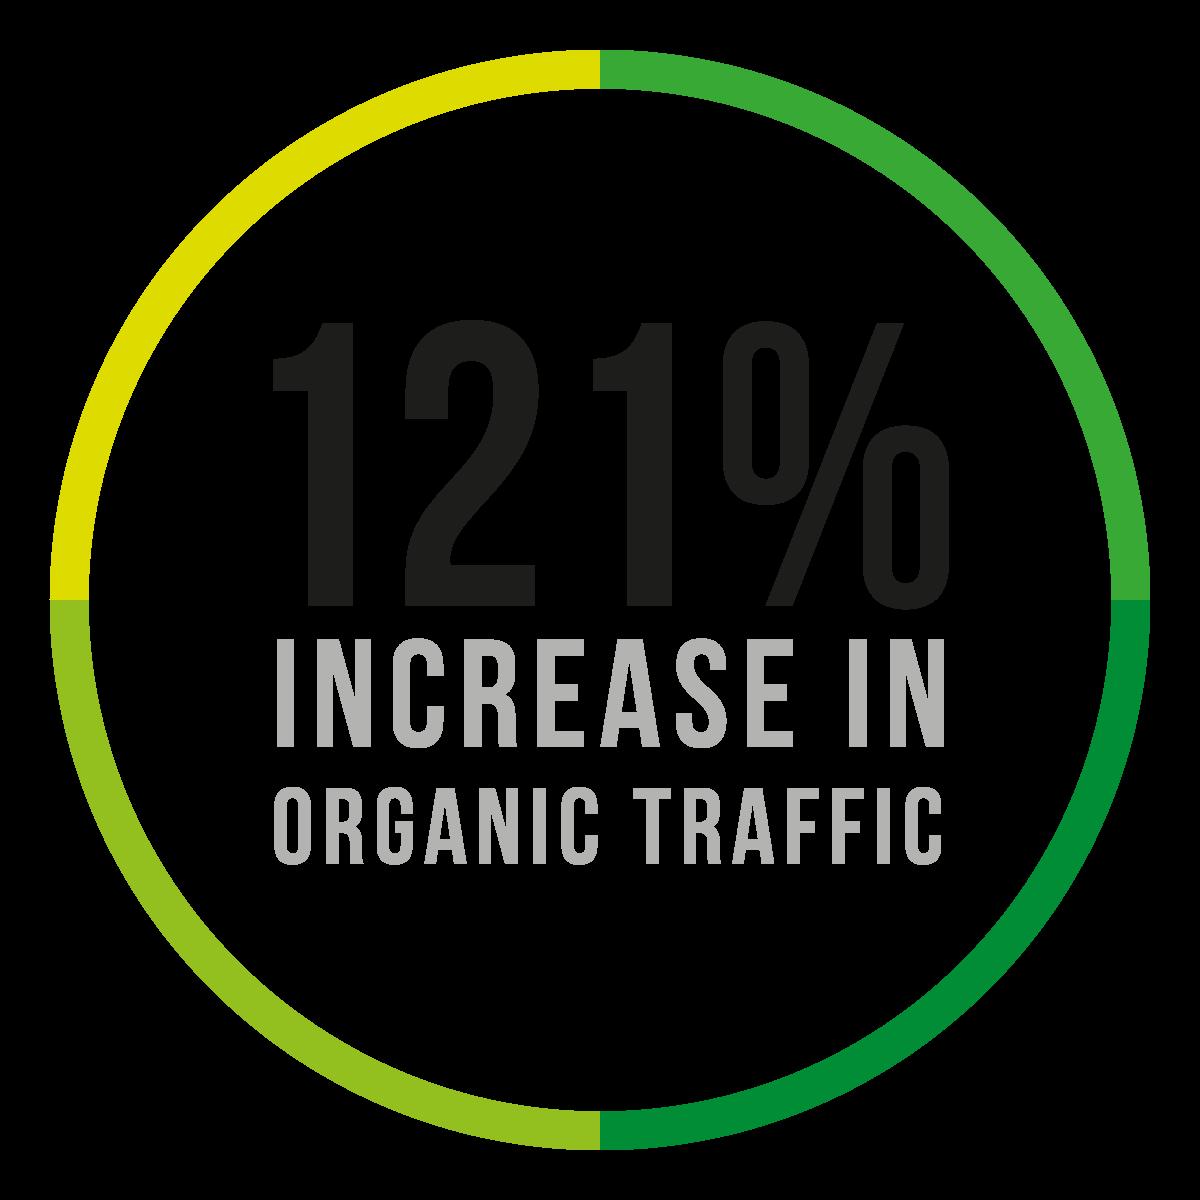 Gate Auto - 121% Increase In Organic Traffic